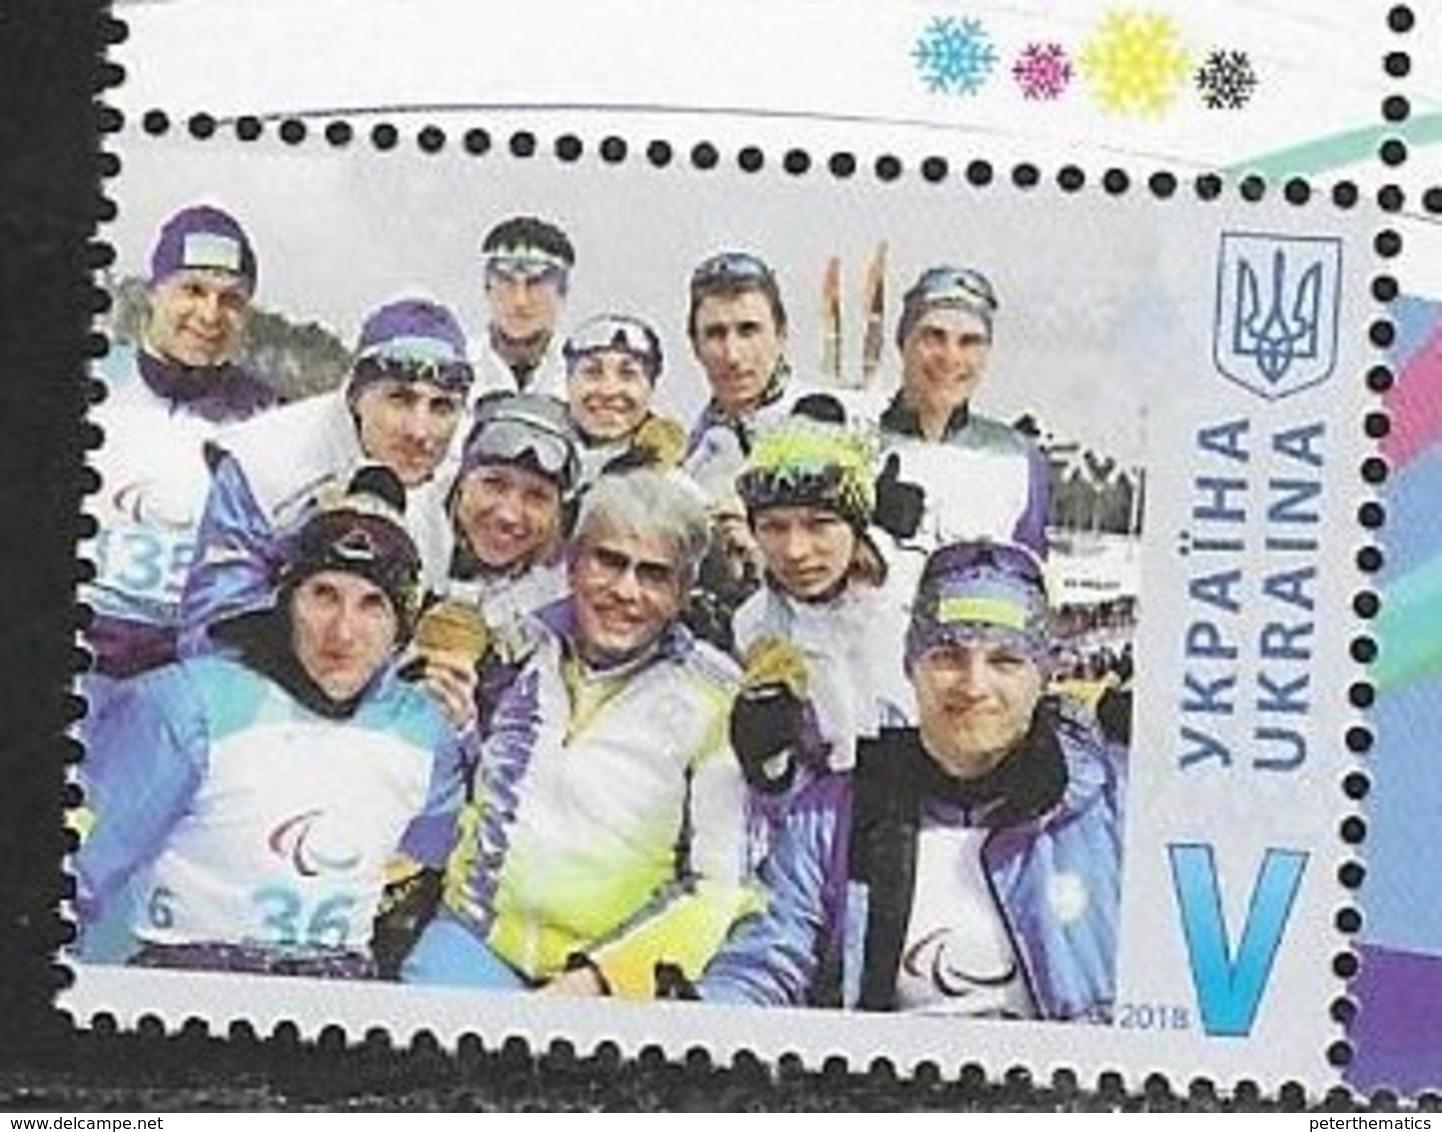 UKRAINE, 2018, MNH, WINTER OLYMPICS, PYEONGCHANG,1v - Winter 2018: Pyeongchang